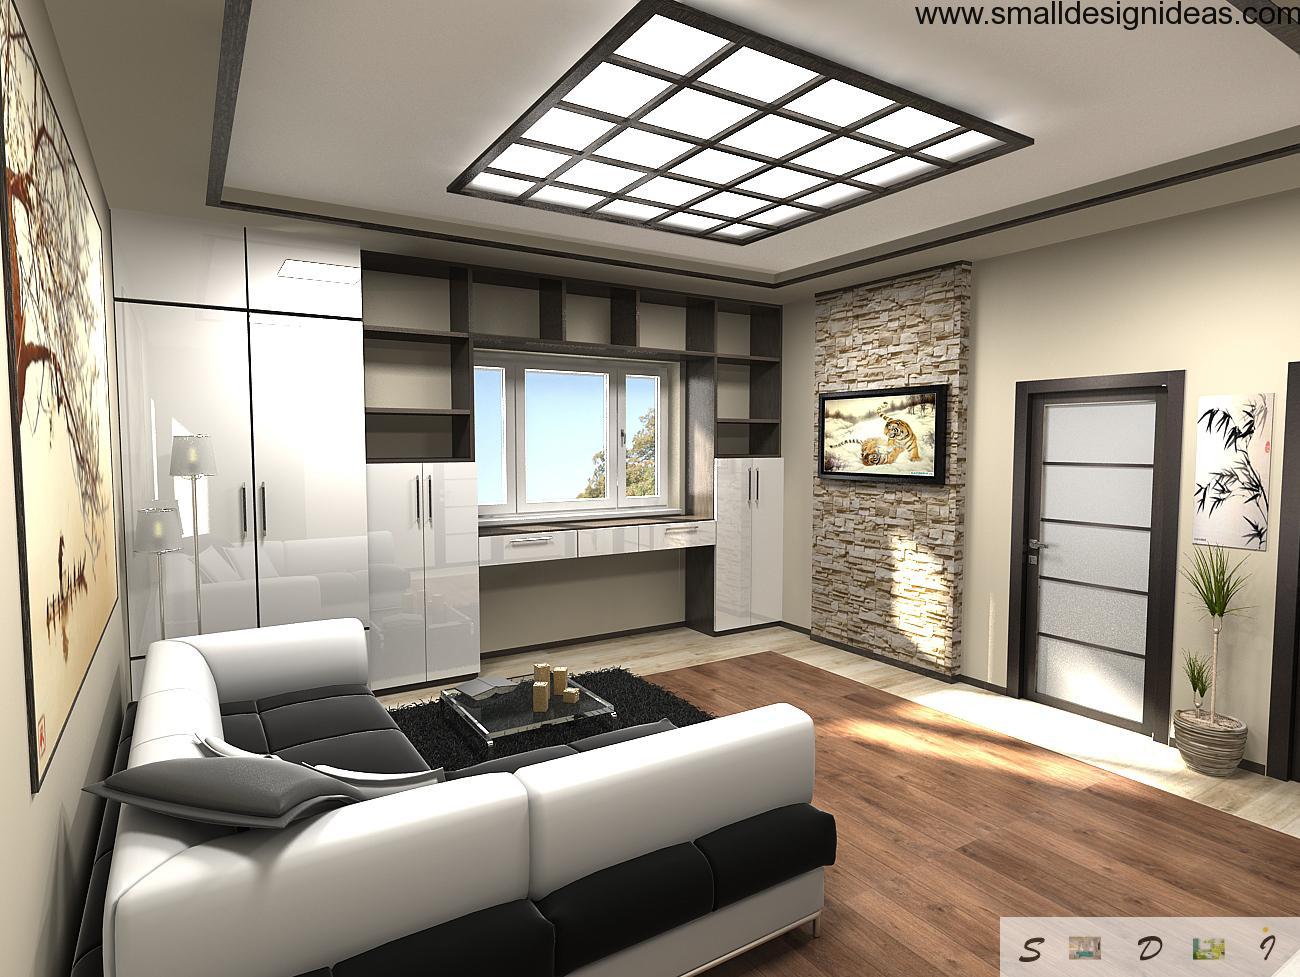 Japanese interior design style for Asian style interior design ideas